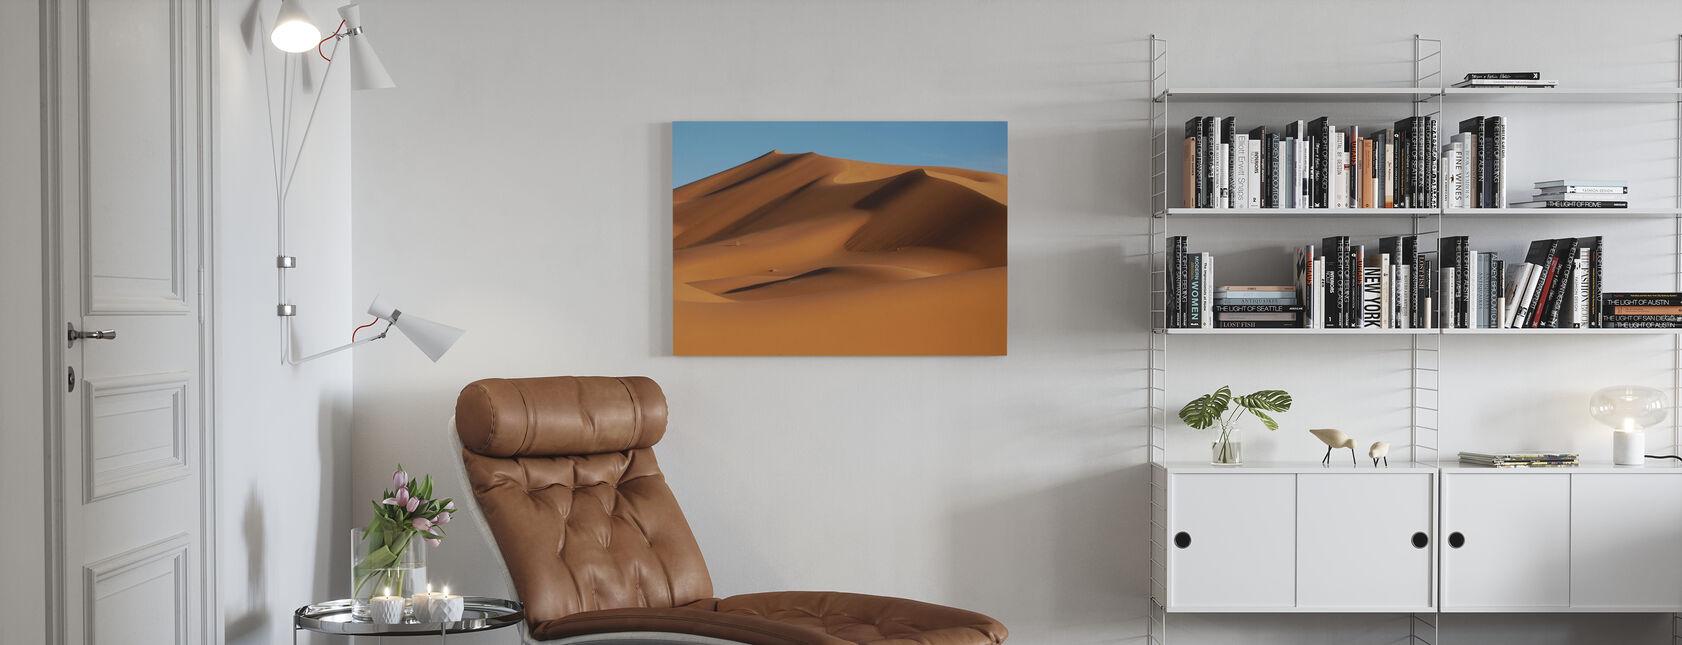 Sahara woestijn - Canvas print - Woonkamer